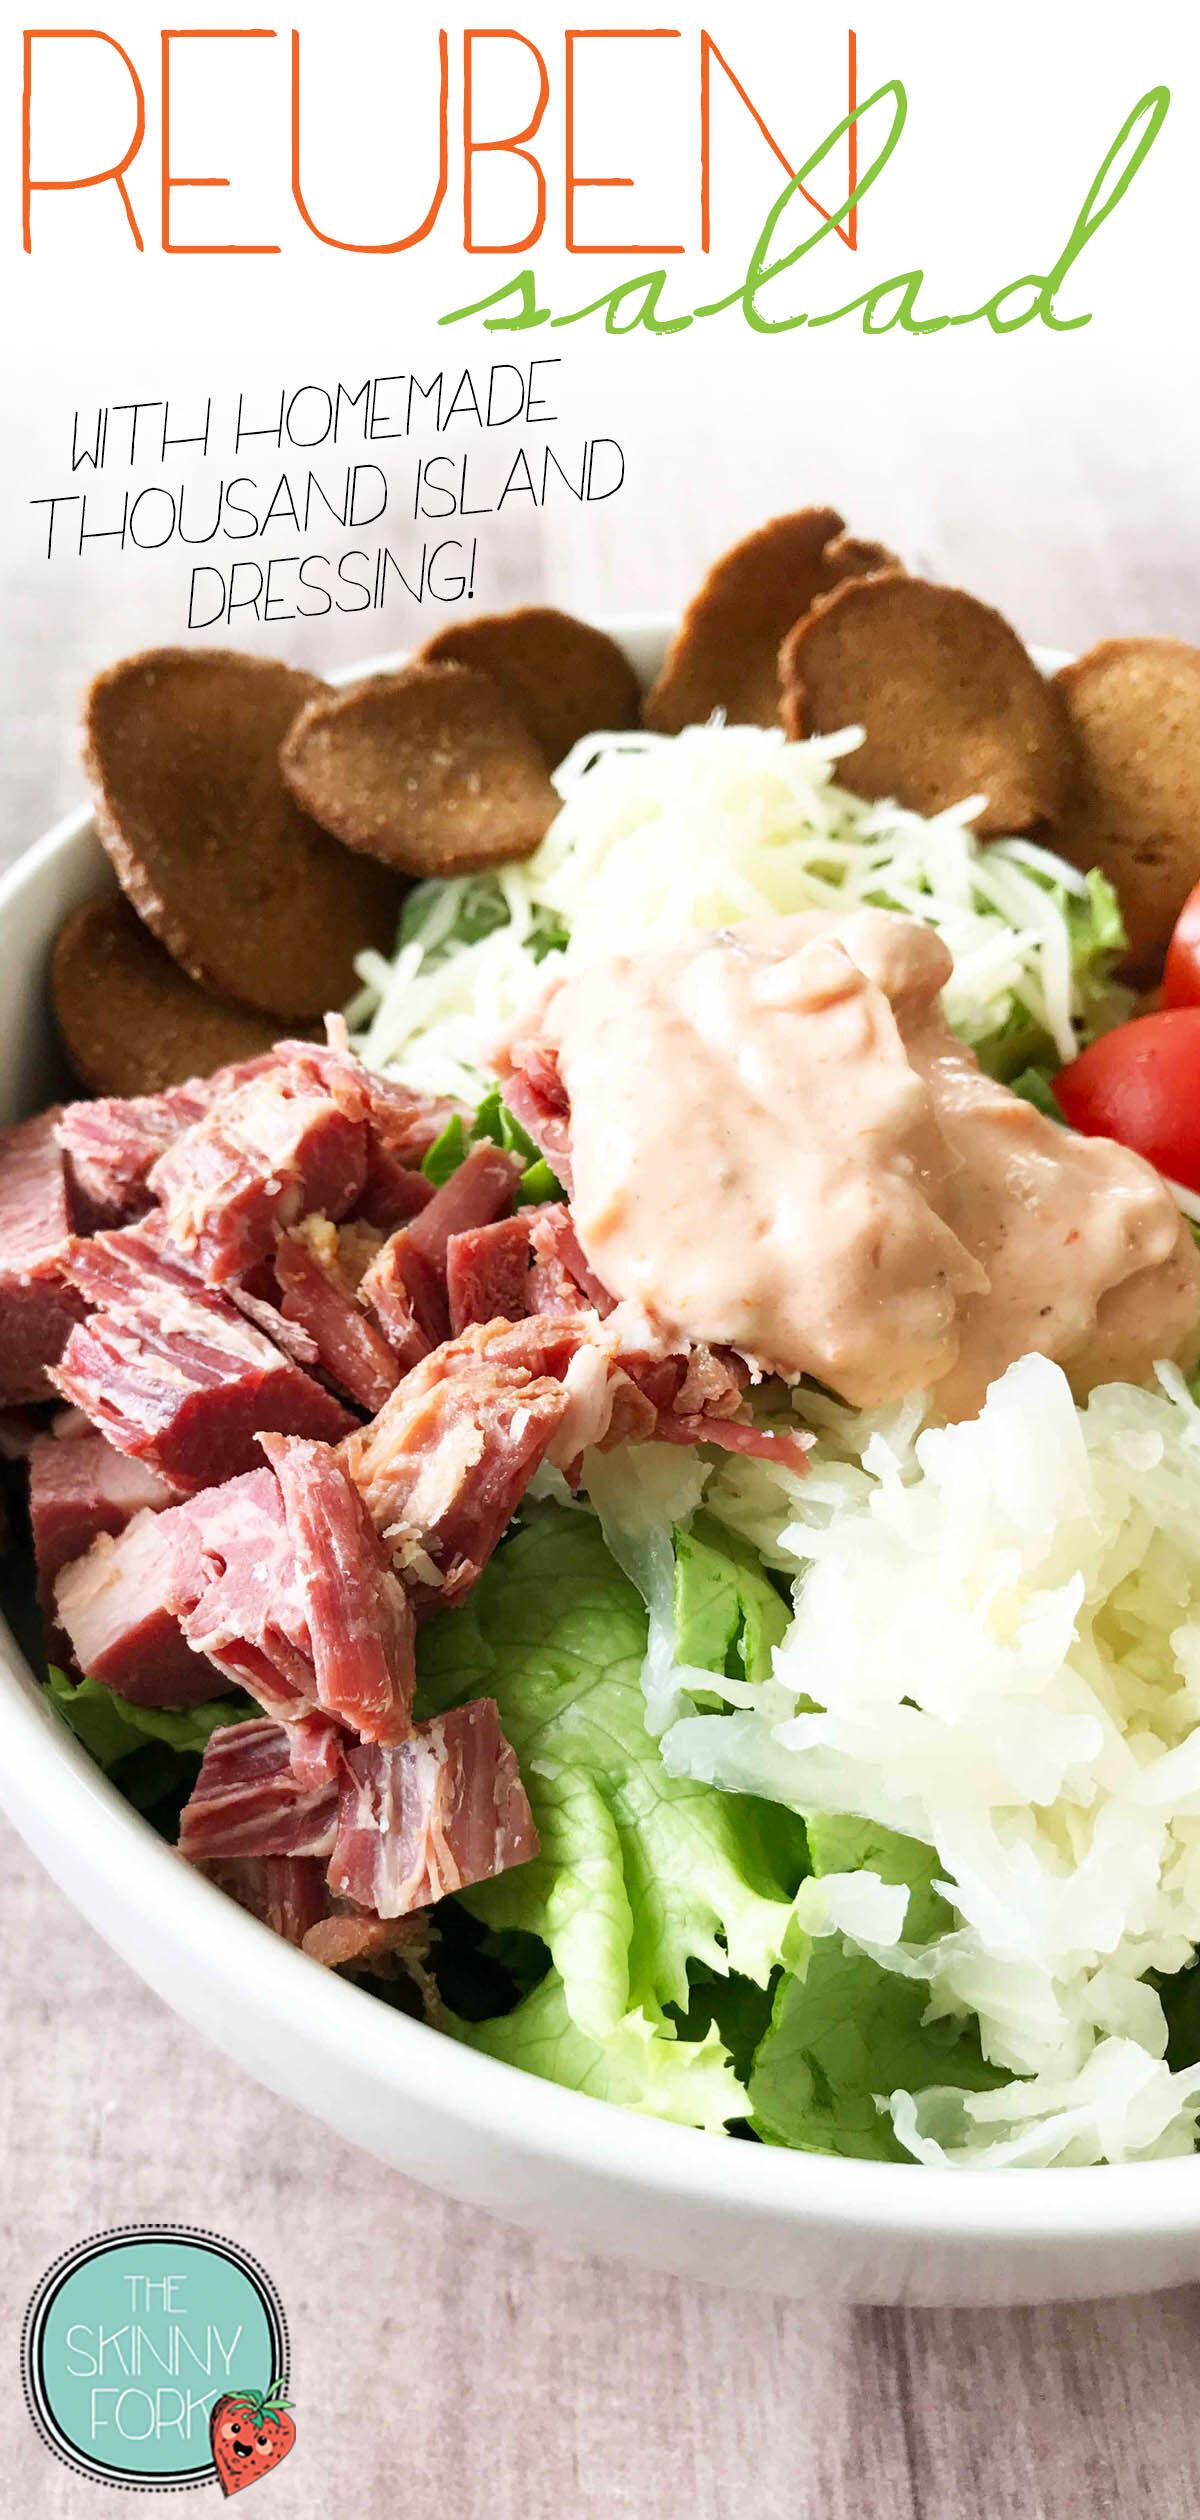 Reuben Salad + Homemade Thousand Island Dressing